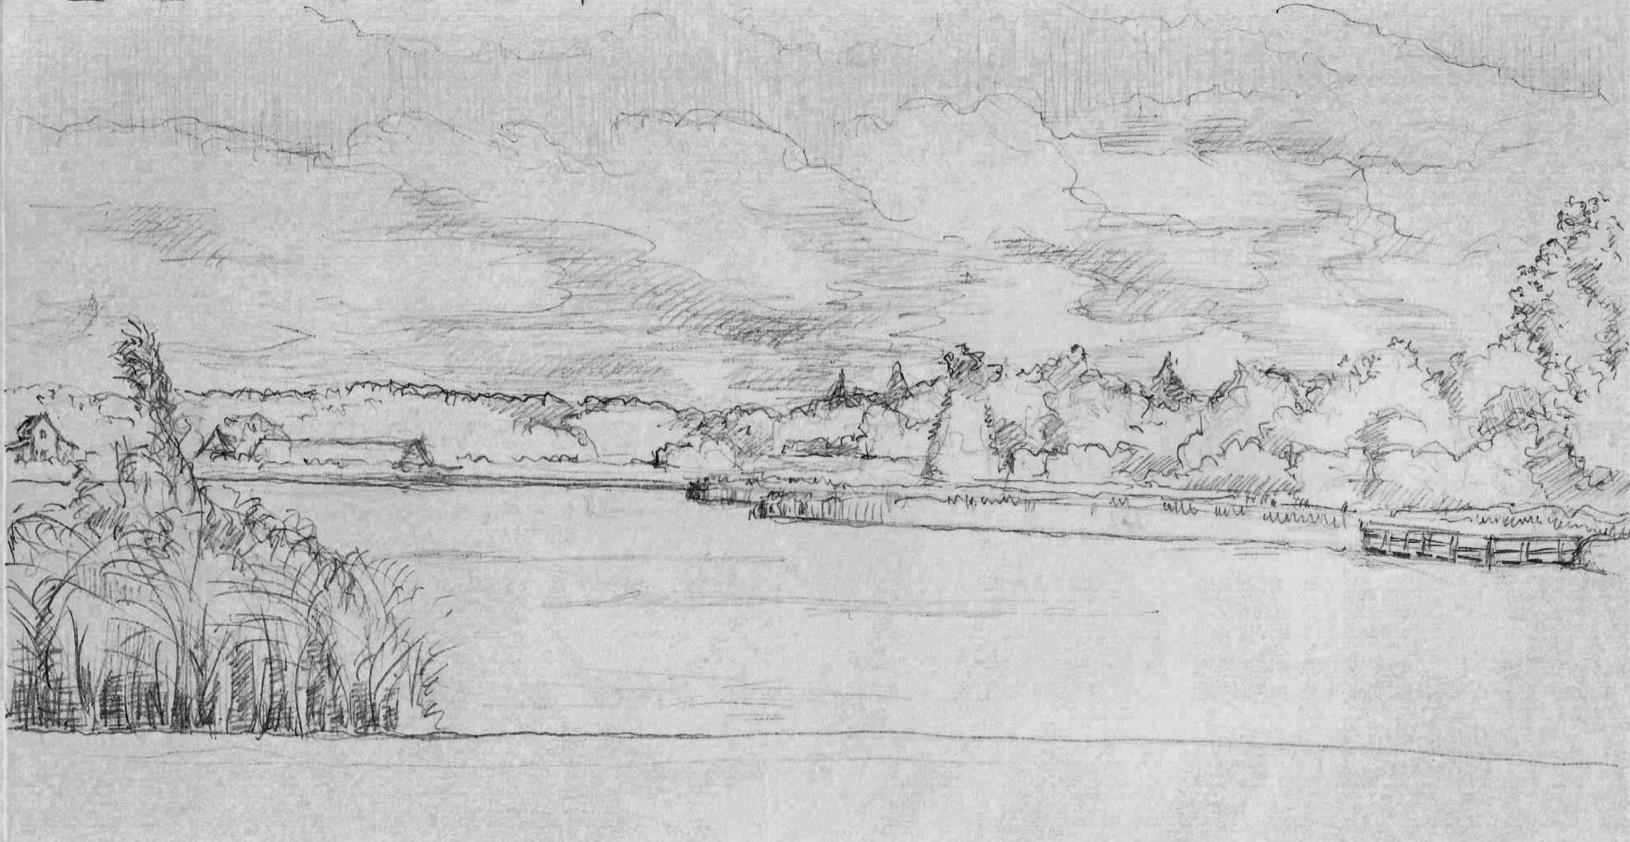 Lake Charlotte - Original pencil drawing